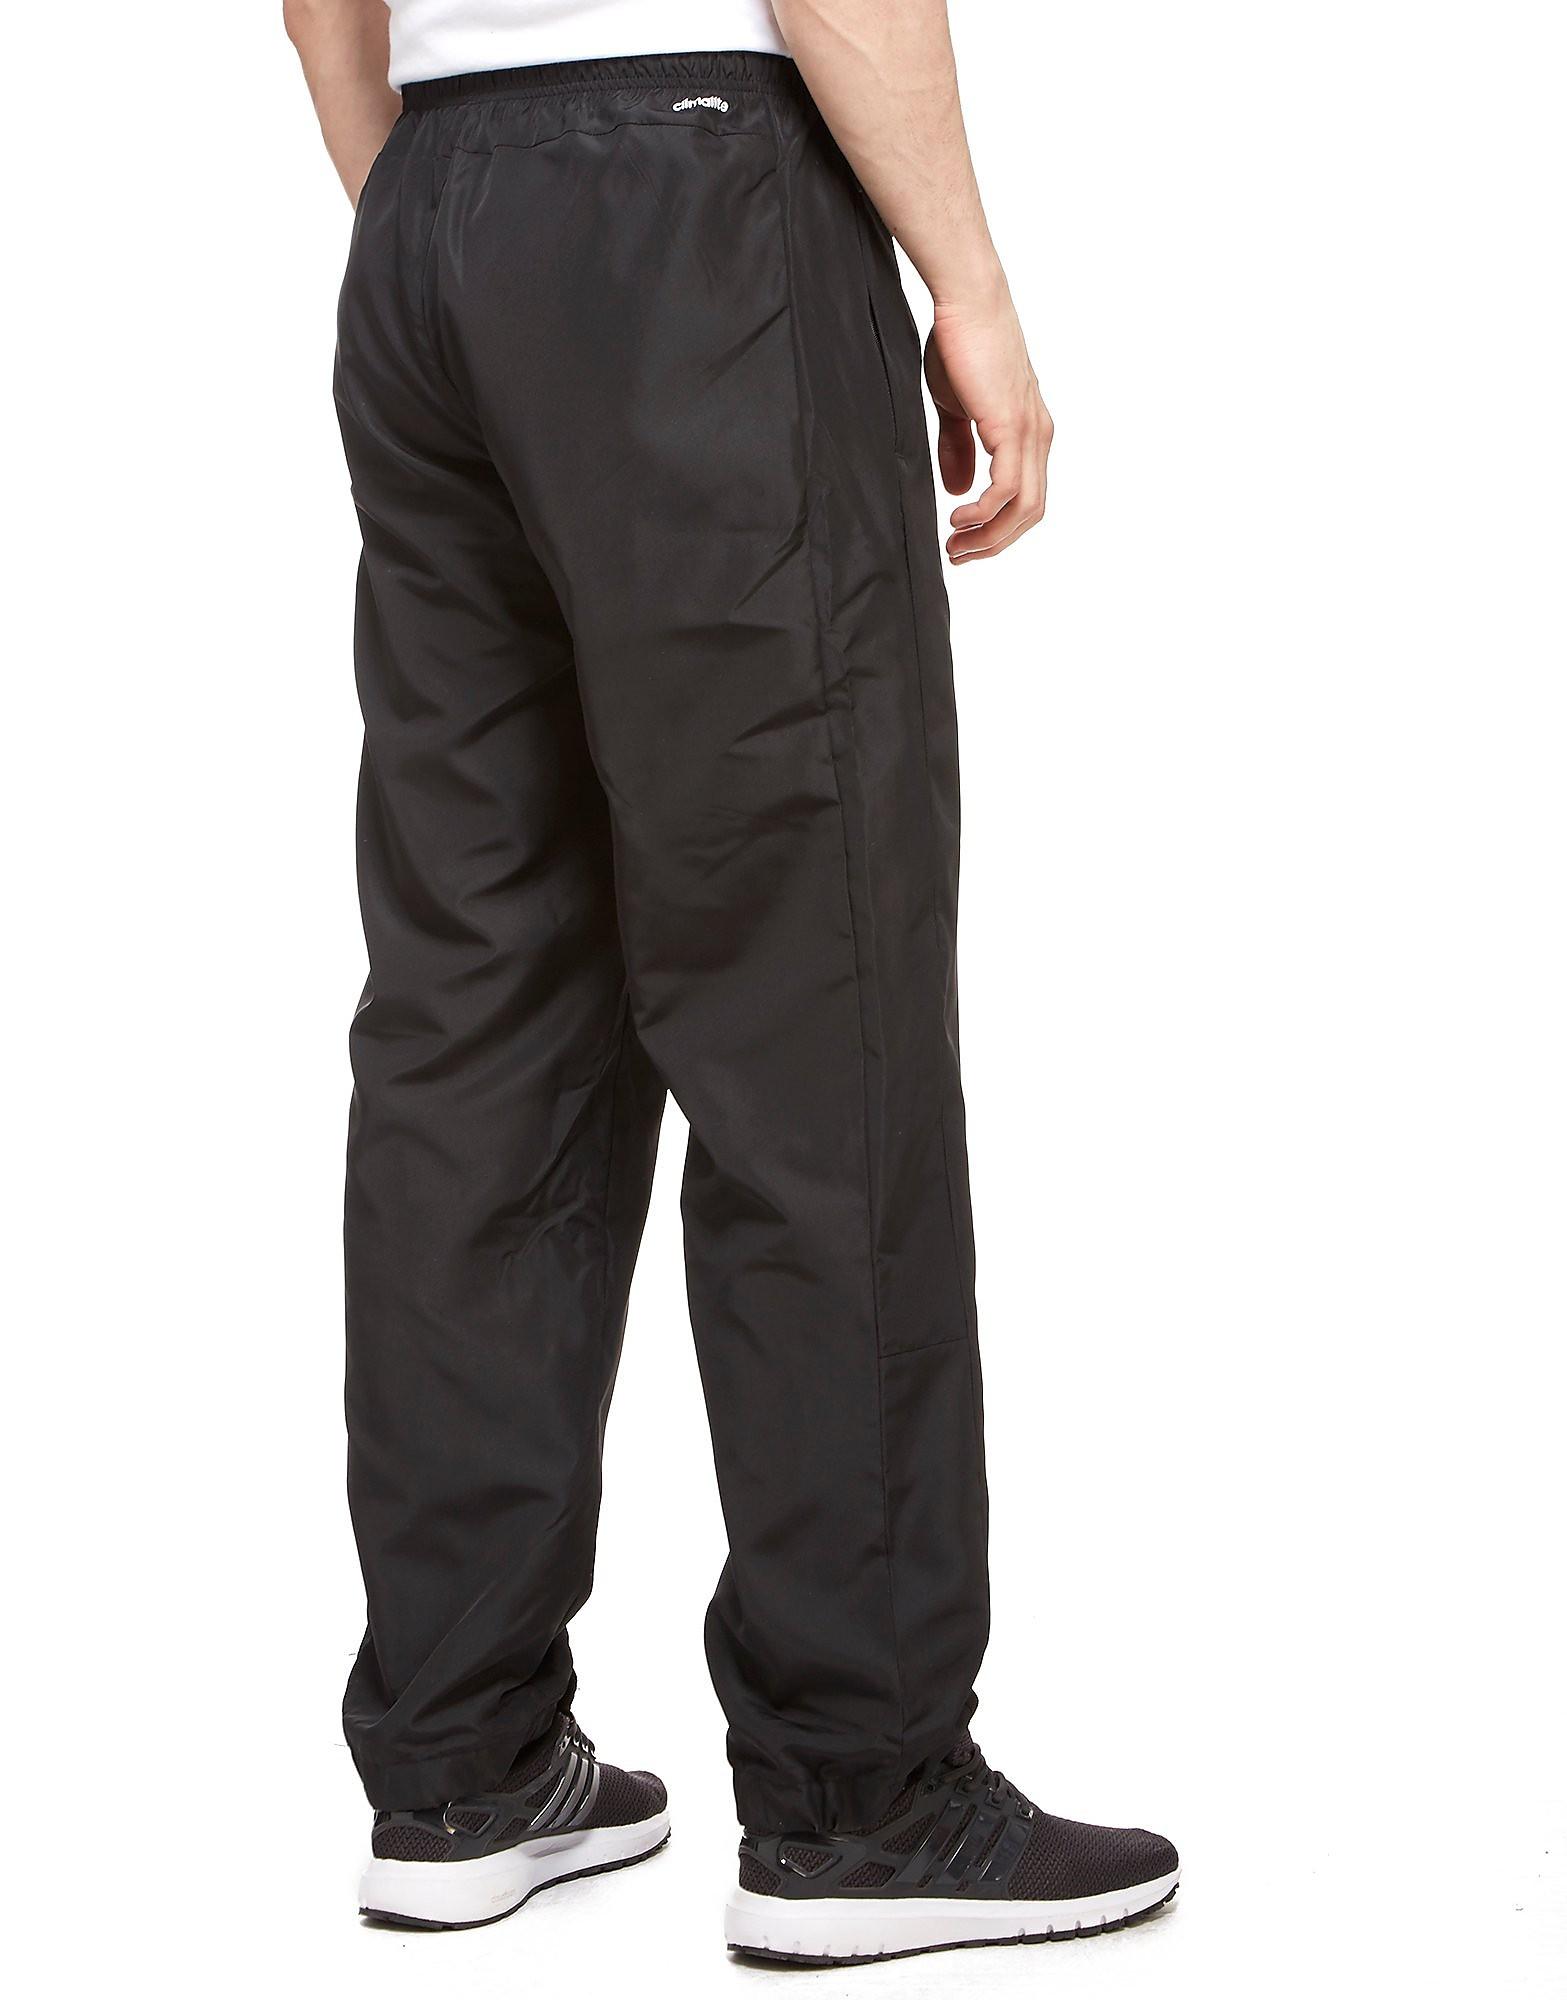 adidas KP7 Woven Pants